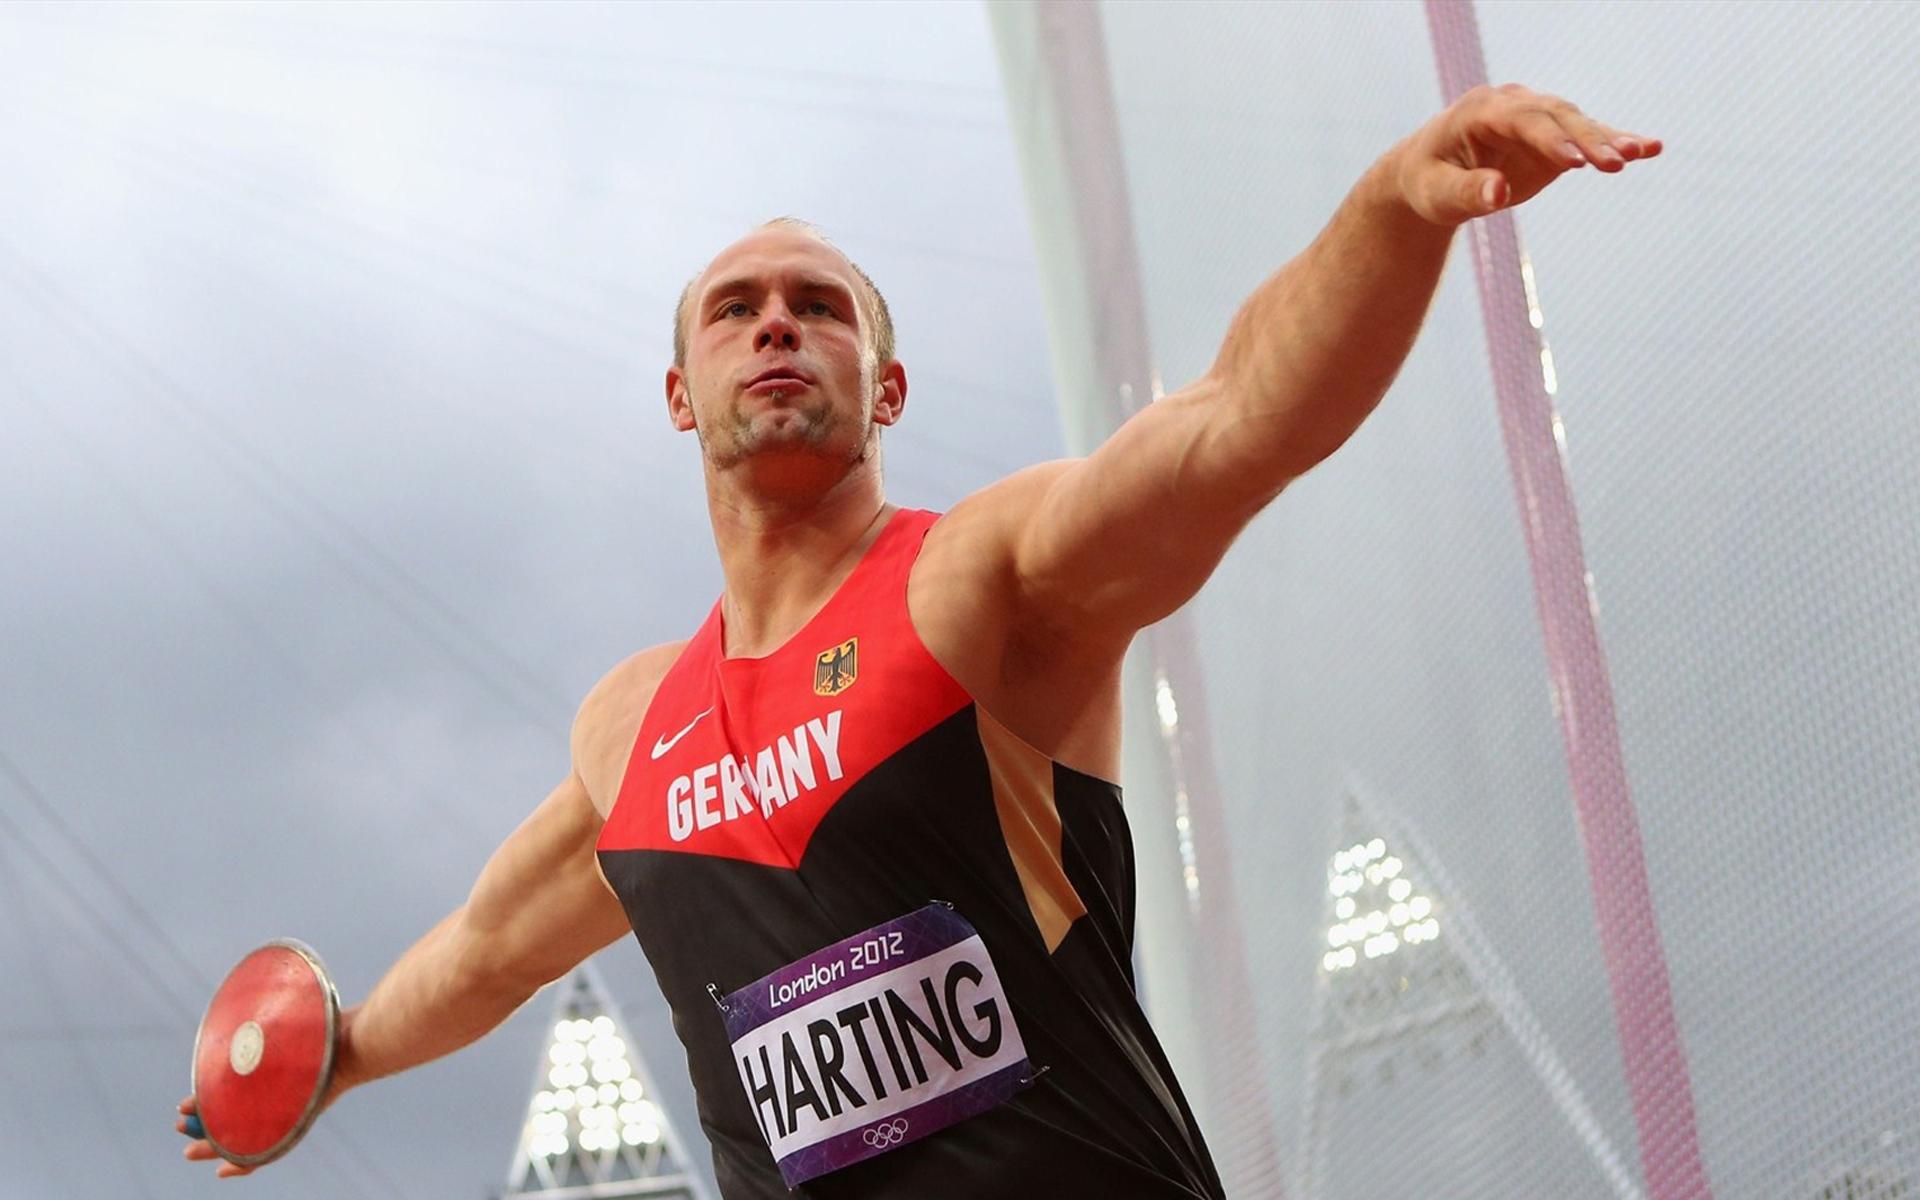 sport_london_2012_olympic_games_robert_harting_034541_